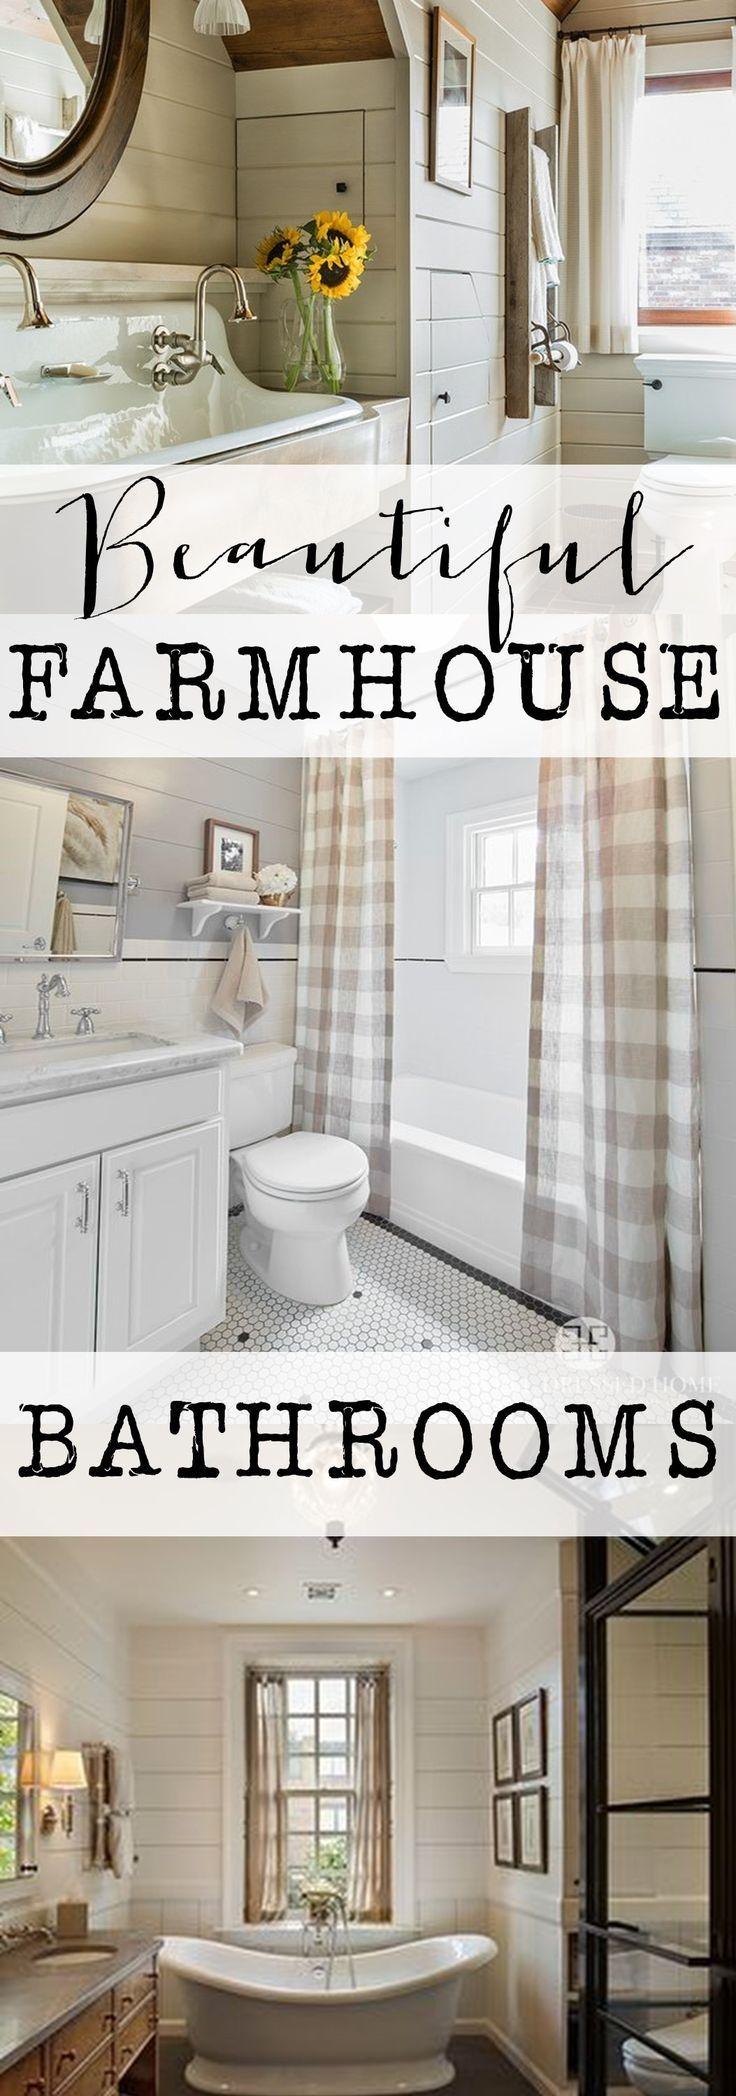 If you love farmhouse, shiplap, vintage, farm sinks, tile ...